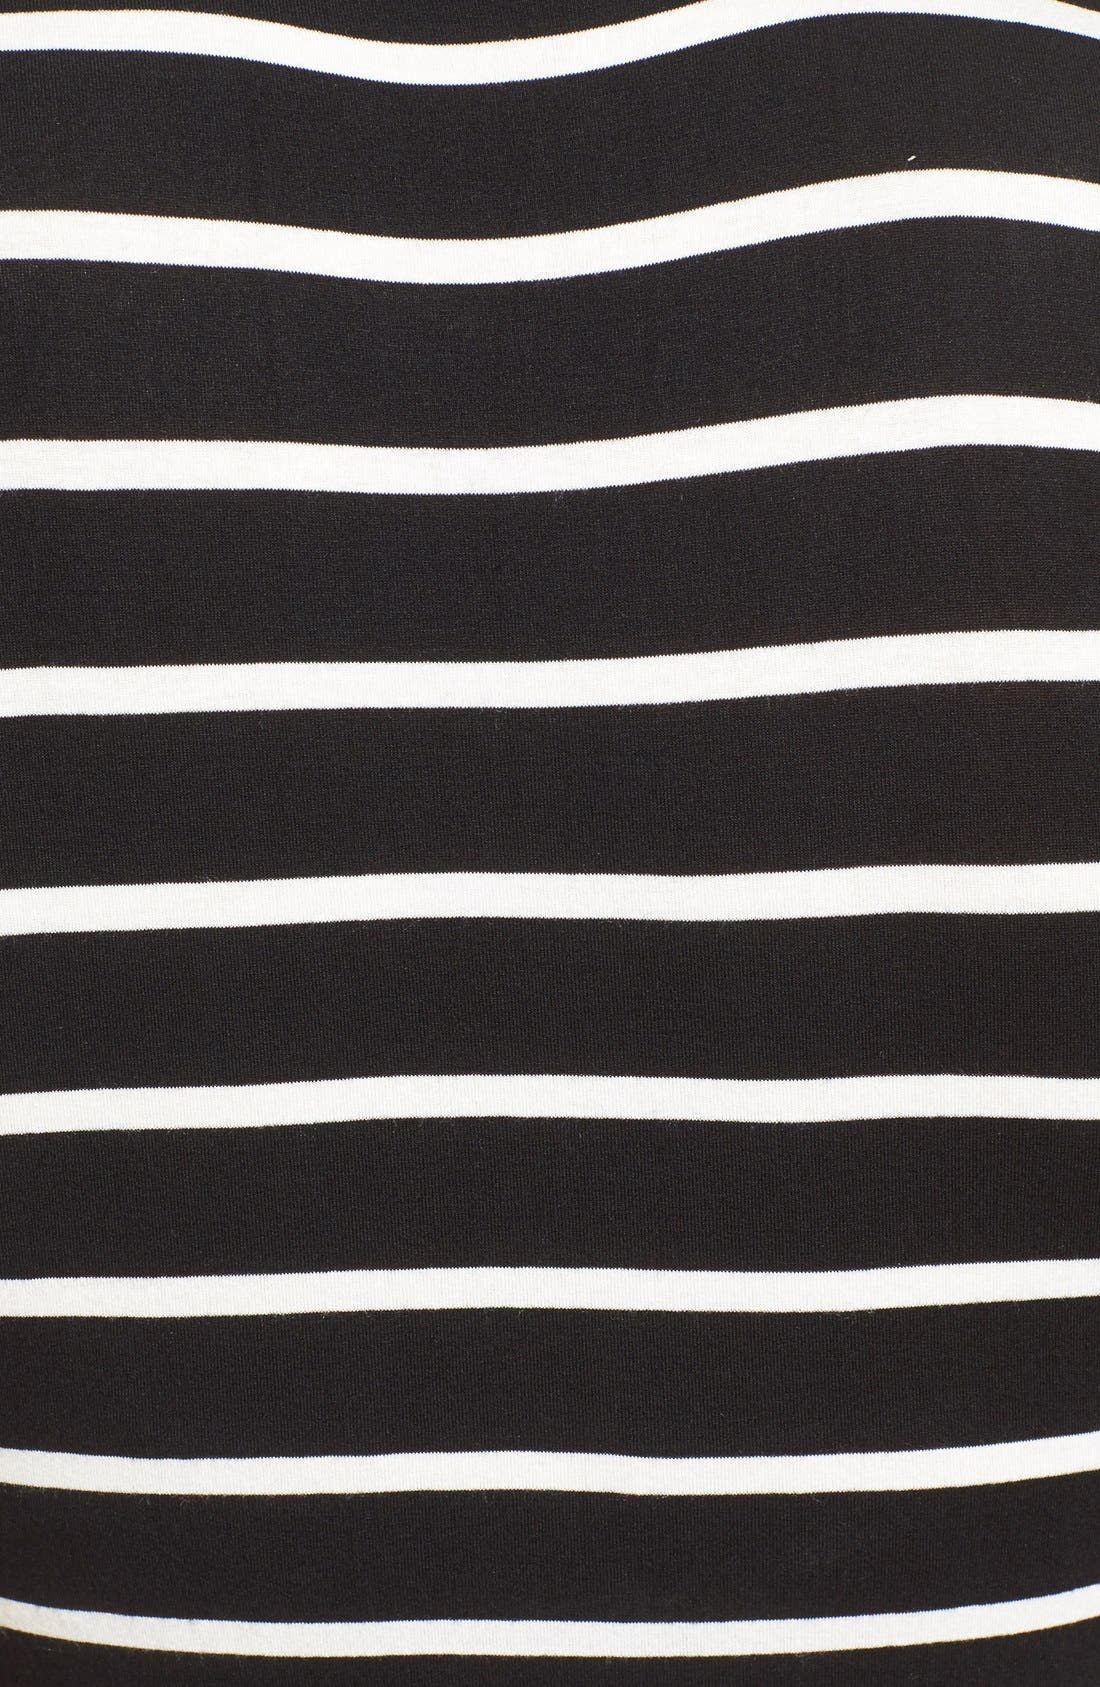 Stripe V-Neck A-Line Maxi Dress,                             Alternate thumbnail 5, color,